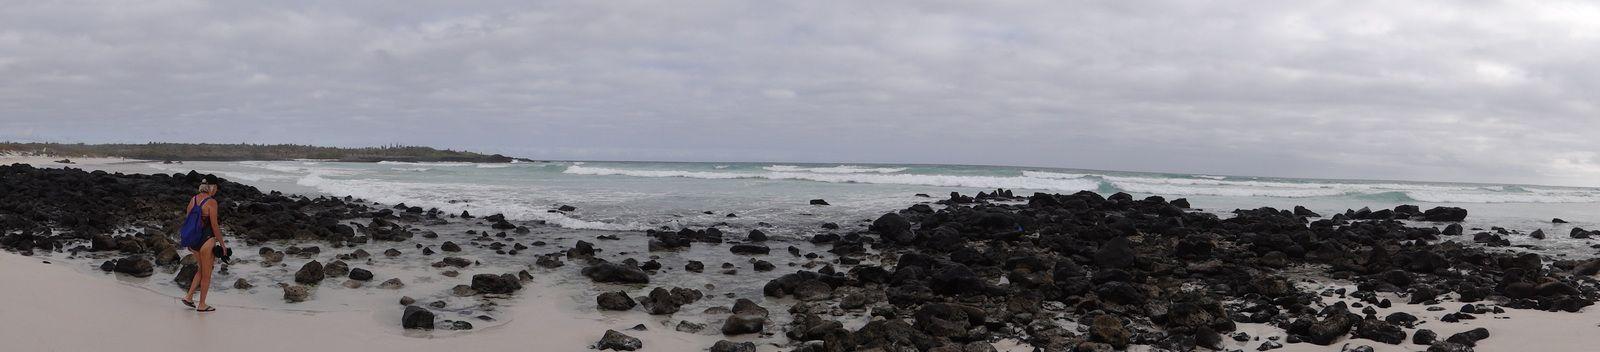 Voyage en EQUATEUR. en 2014. Guayaquil. Iles Galapagos.